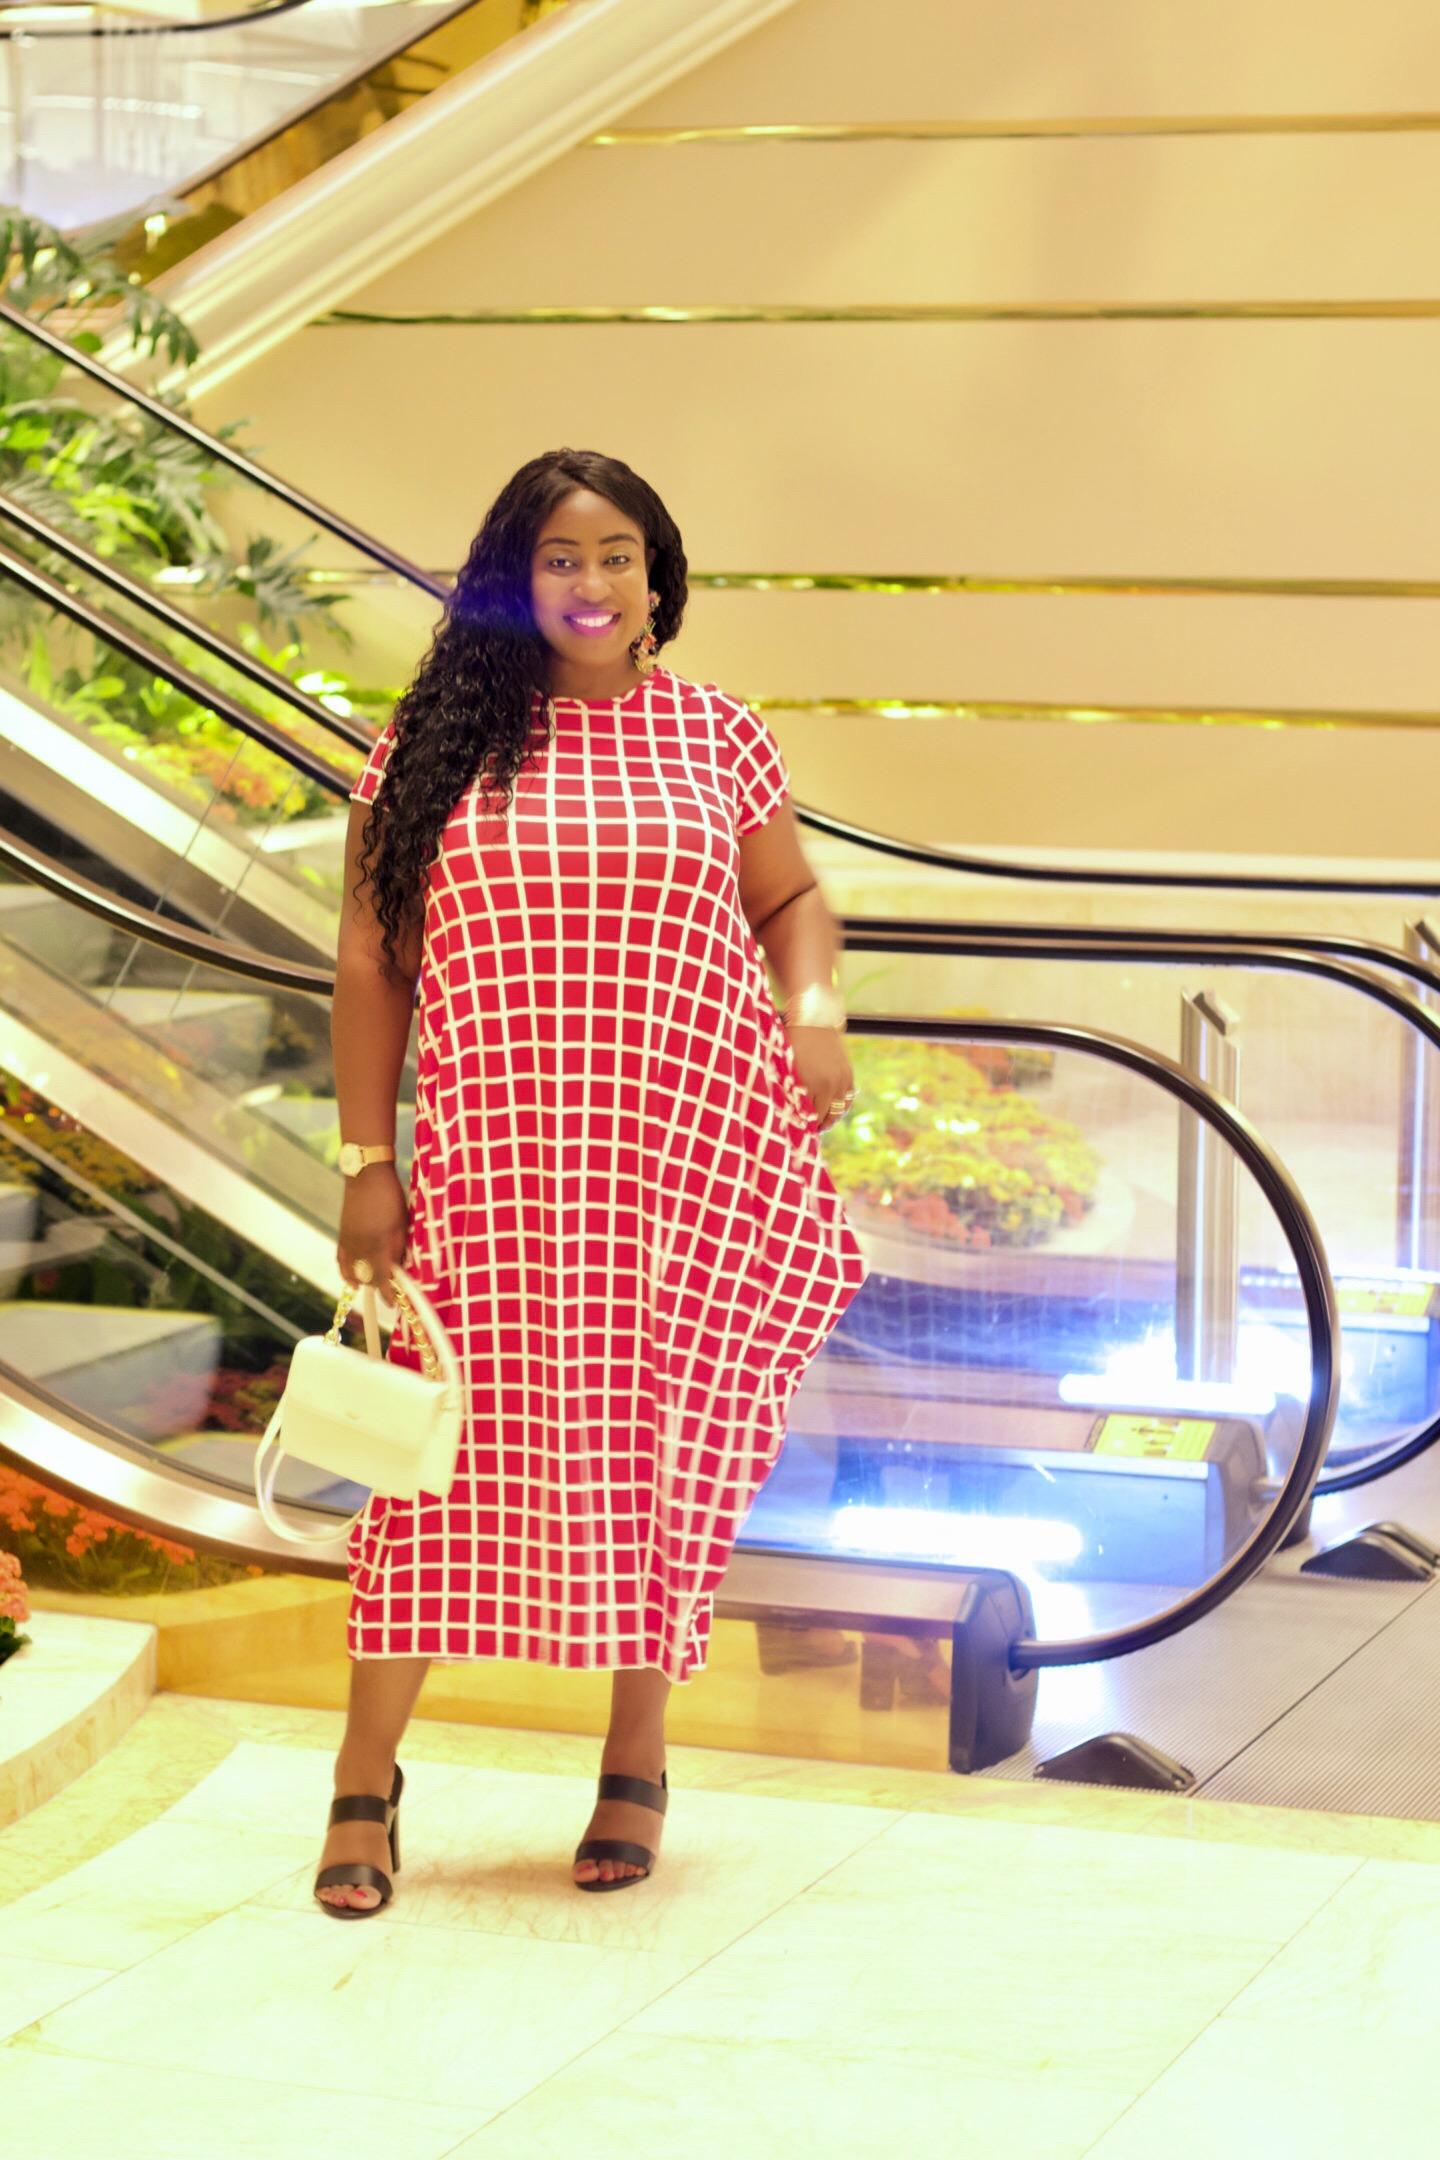 vegas-trip-black-girl-in-red-dress